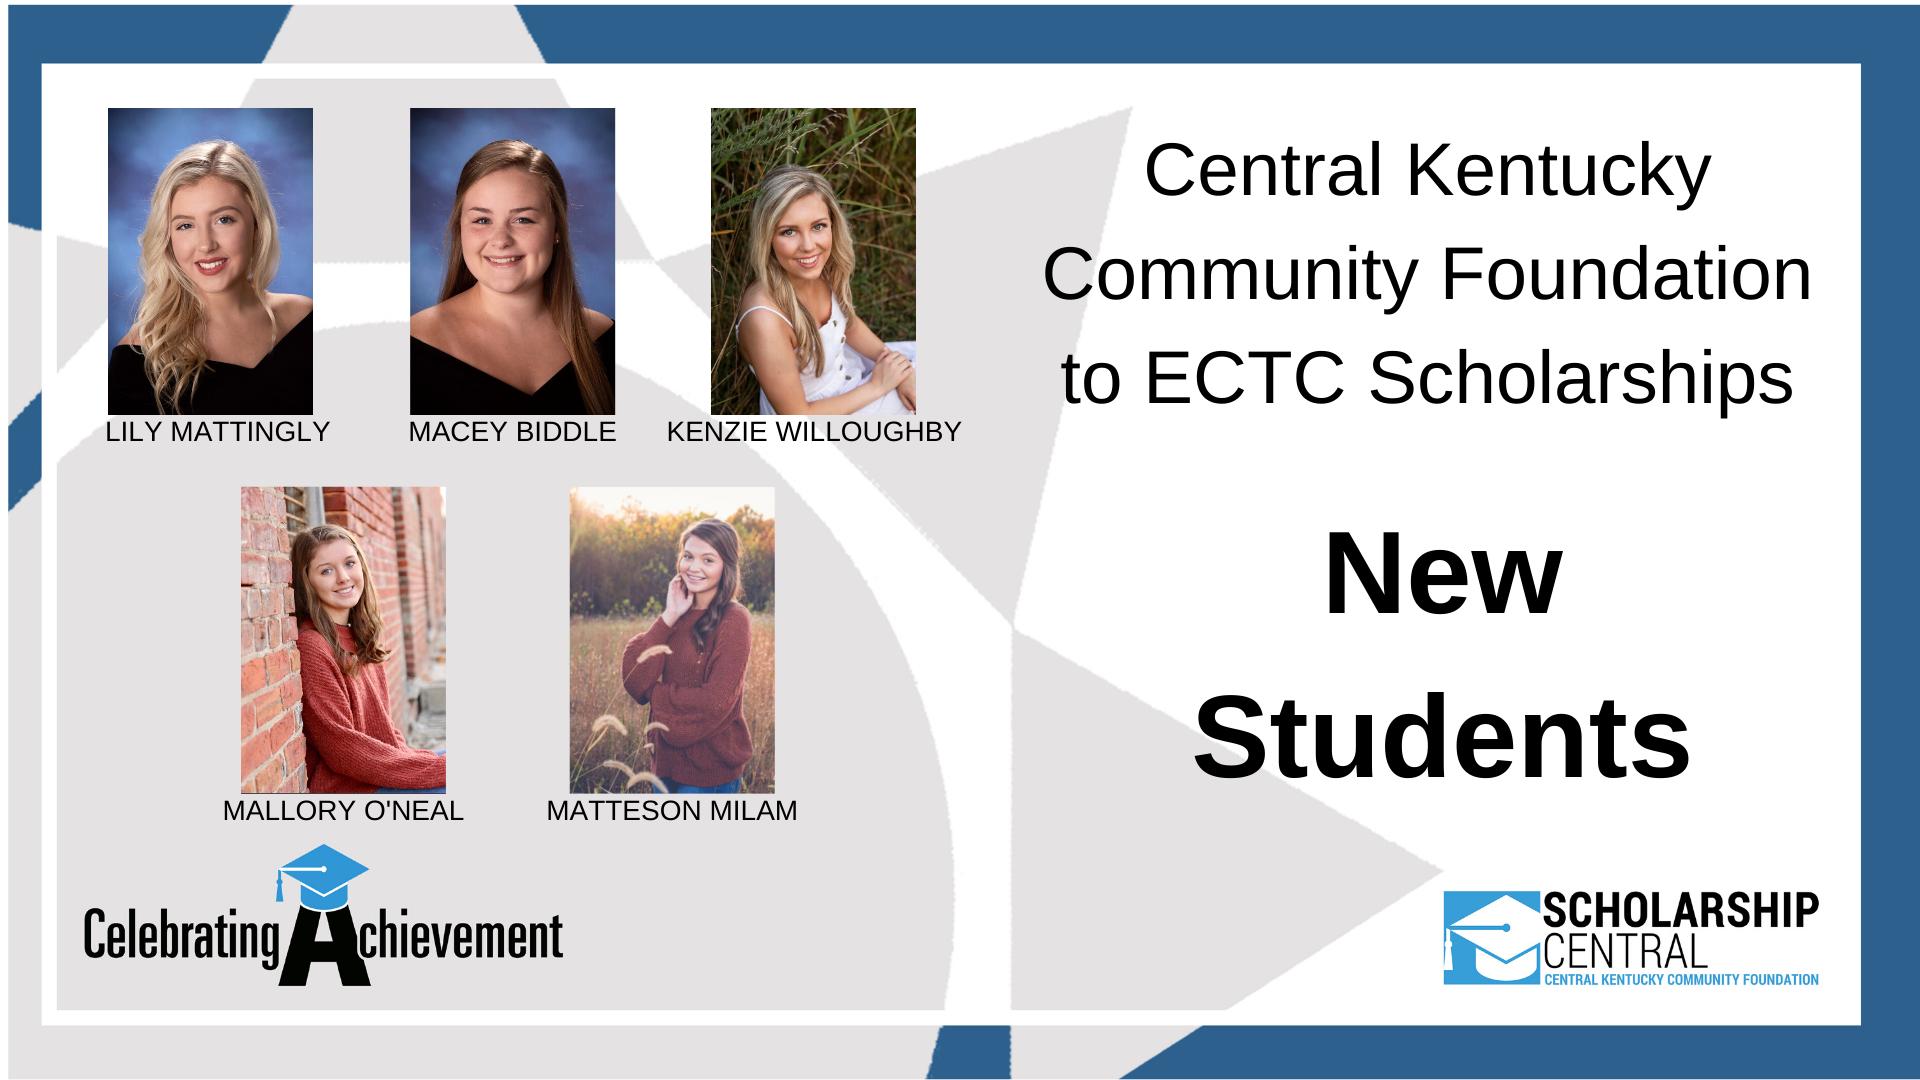 ECTC New Scholarship4